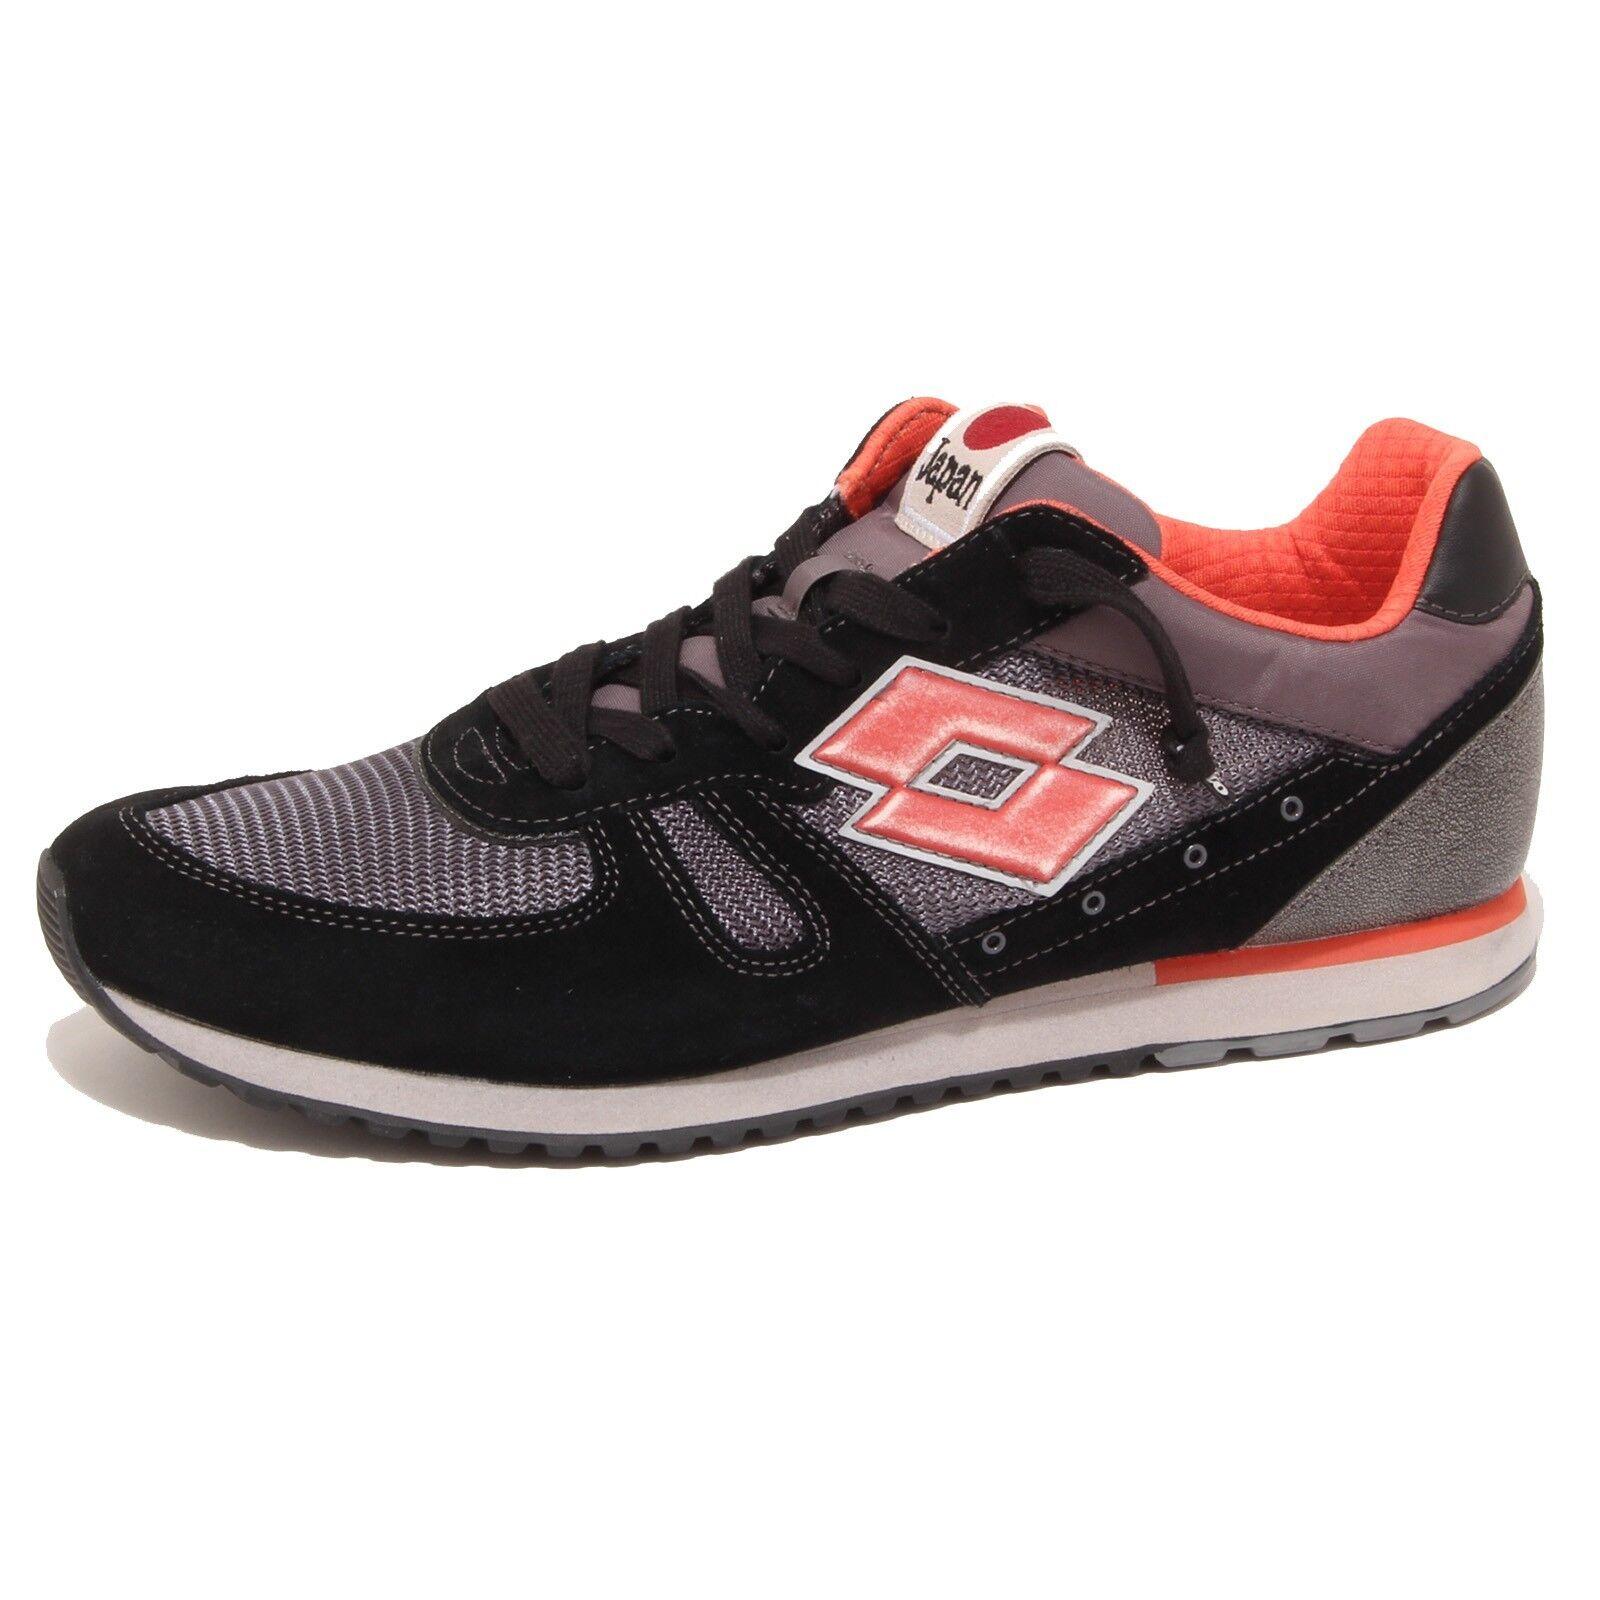 6229P zapatilla de deporte hombres LOTTO LEGGENDA TOKYO SHIBUYA negro gris Zapatos Hombres